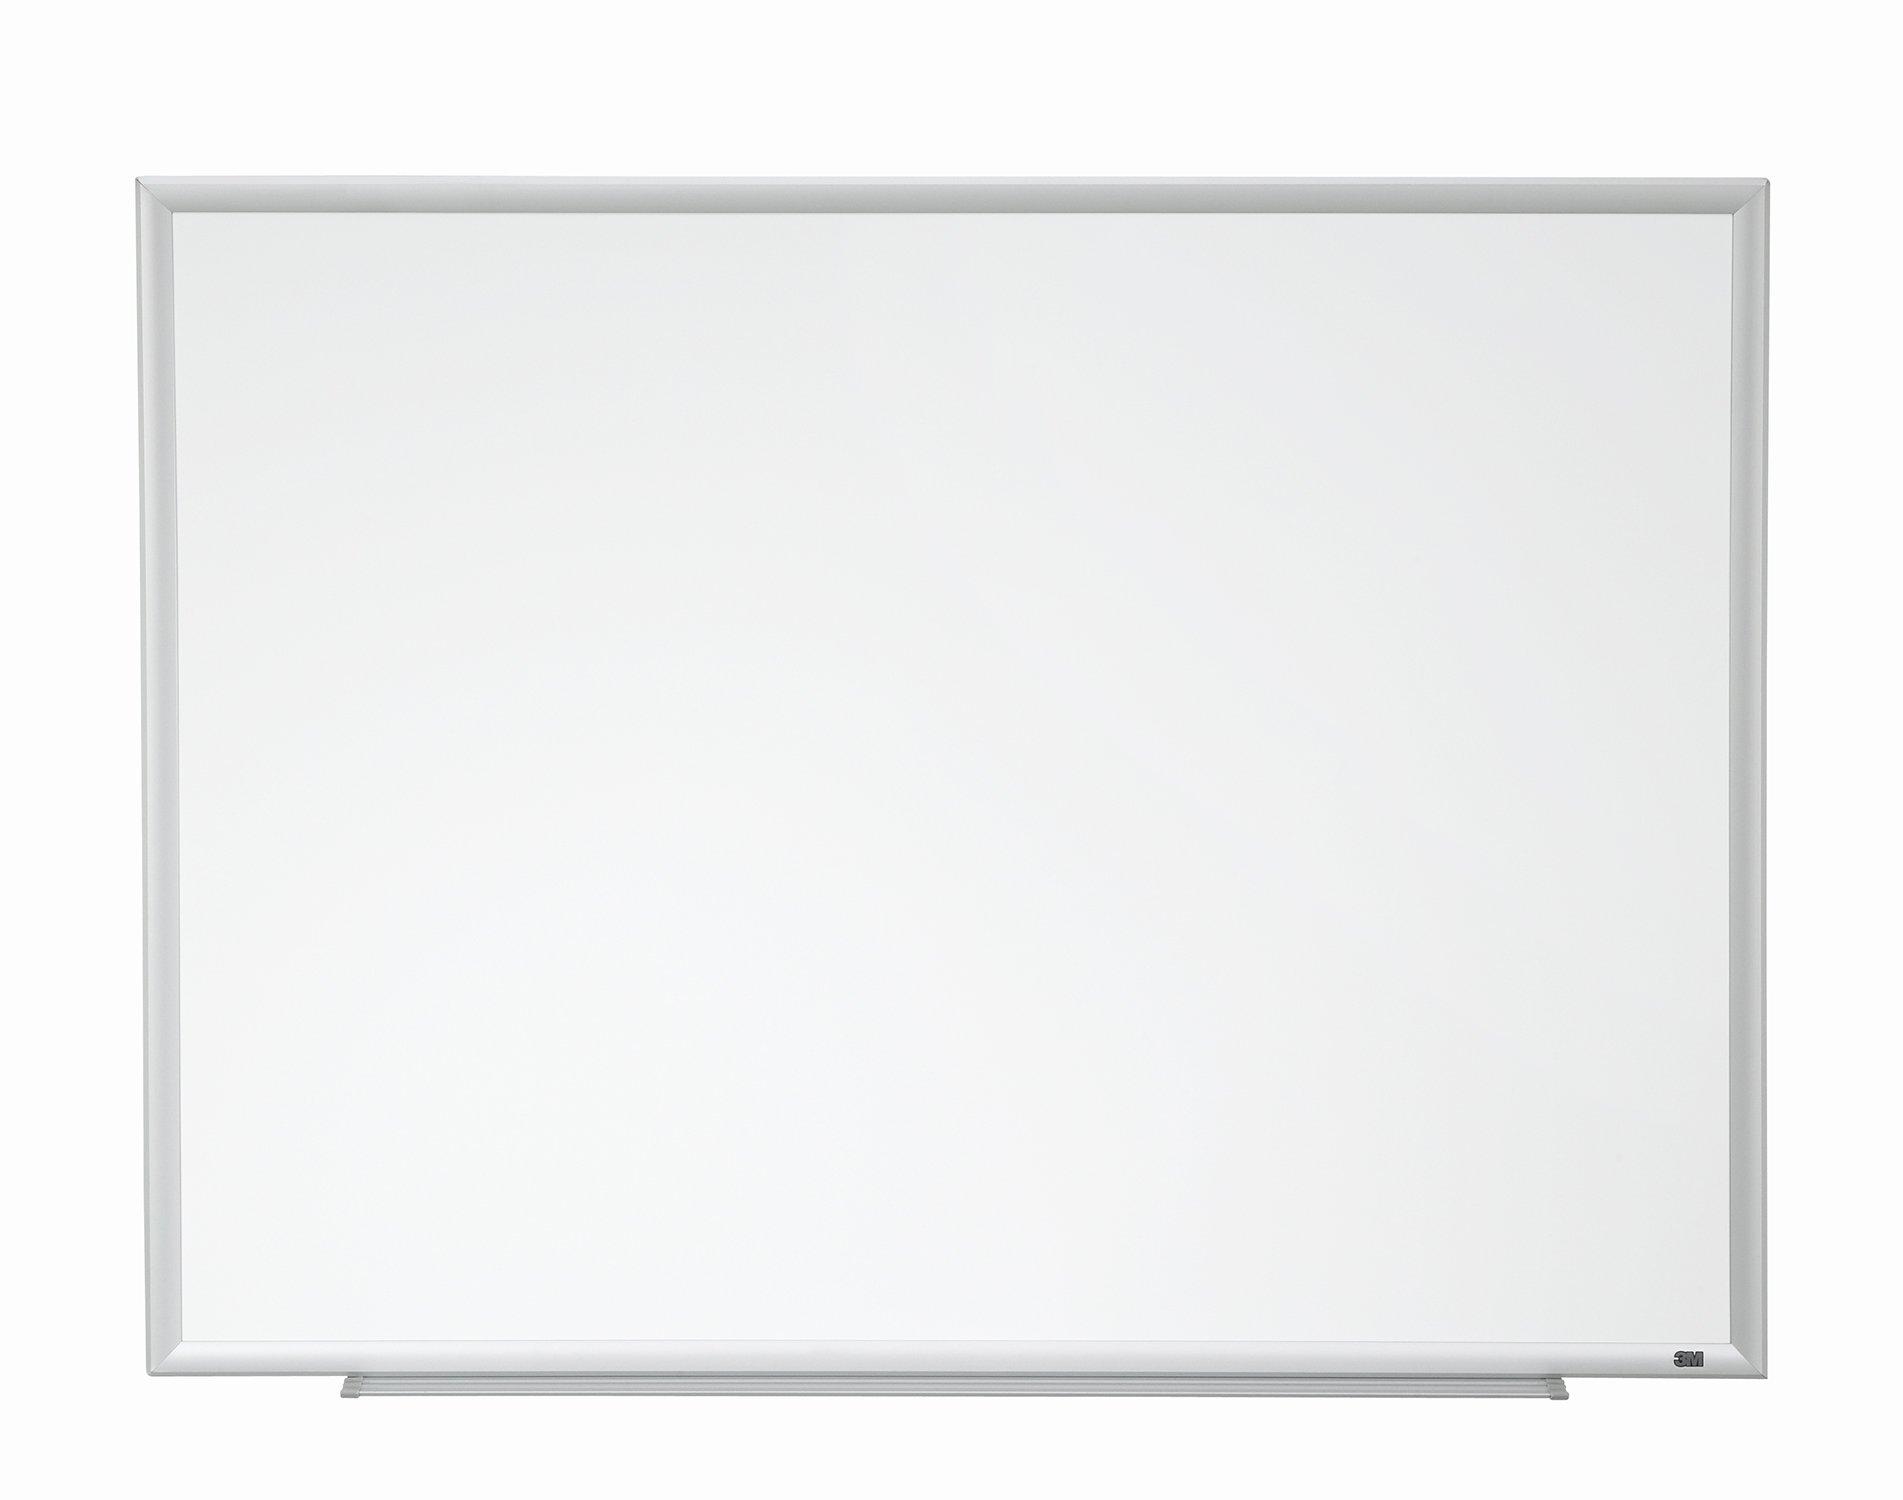 3M Porcelain Dry Erase Board, 60 x 36-Inches, Aluminum Frame